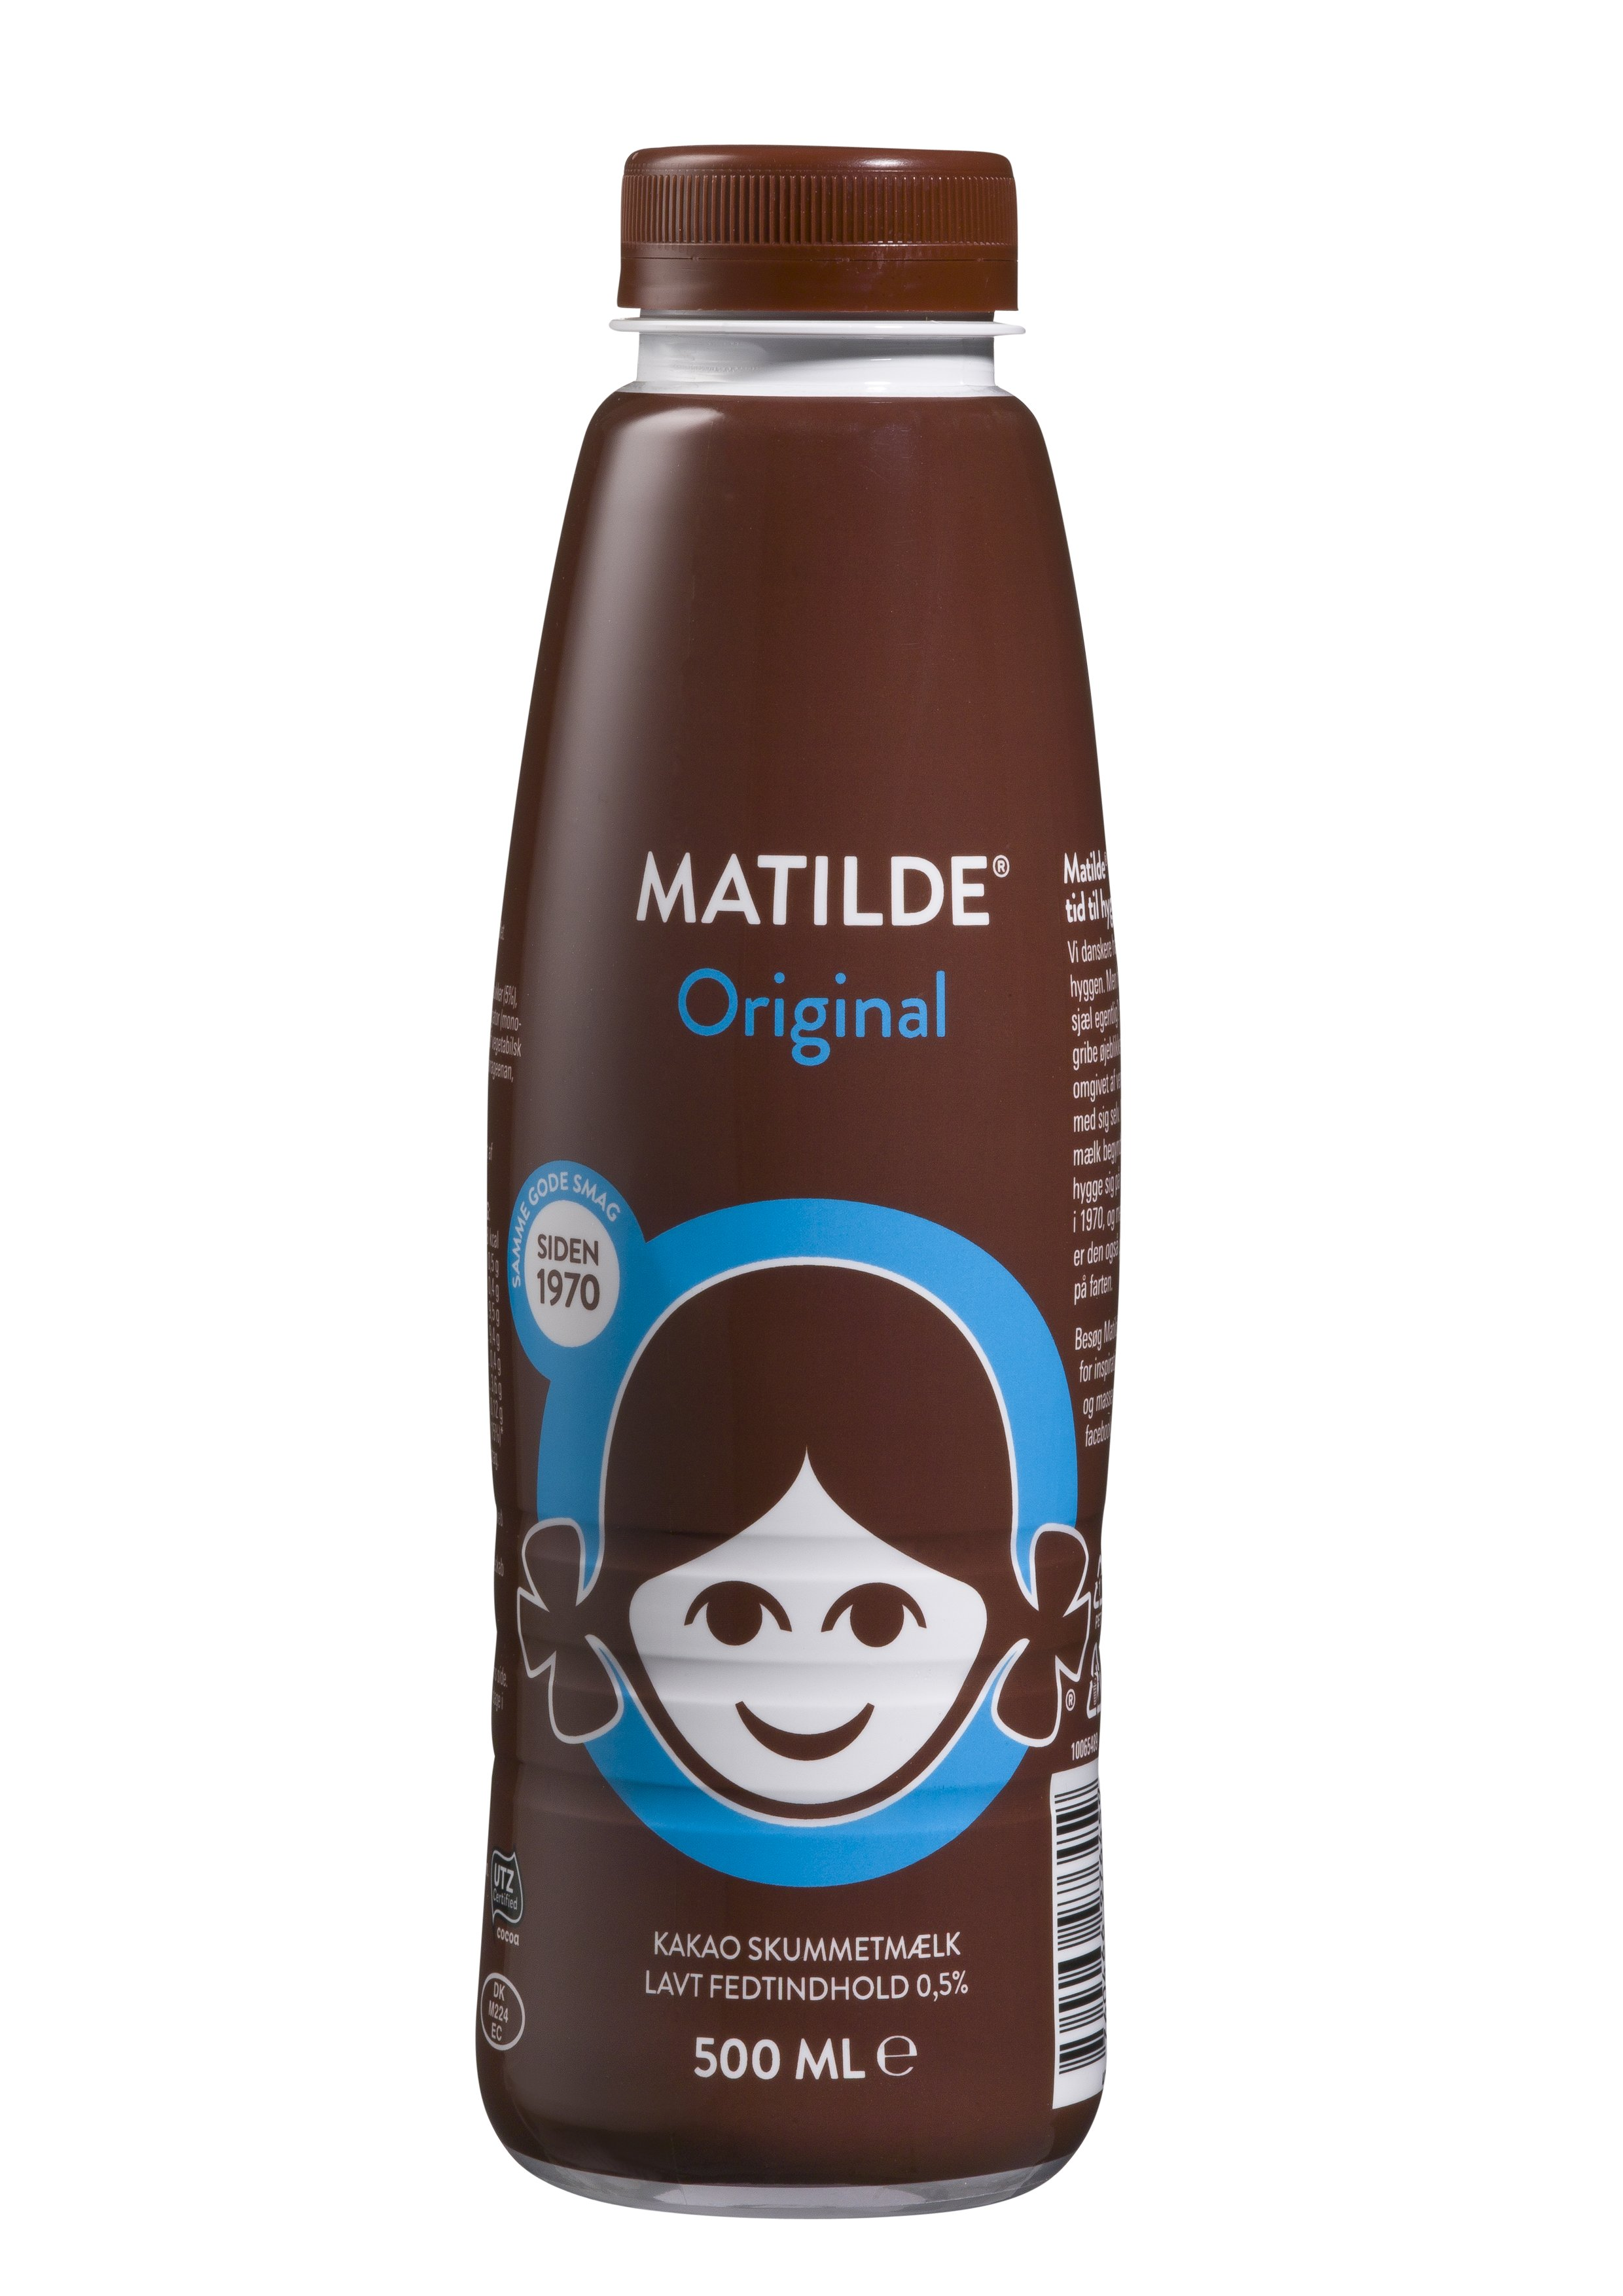 mathilde vanilje mælk